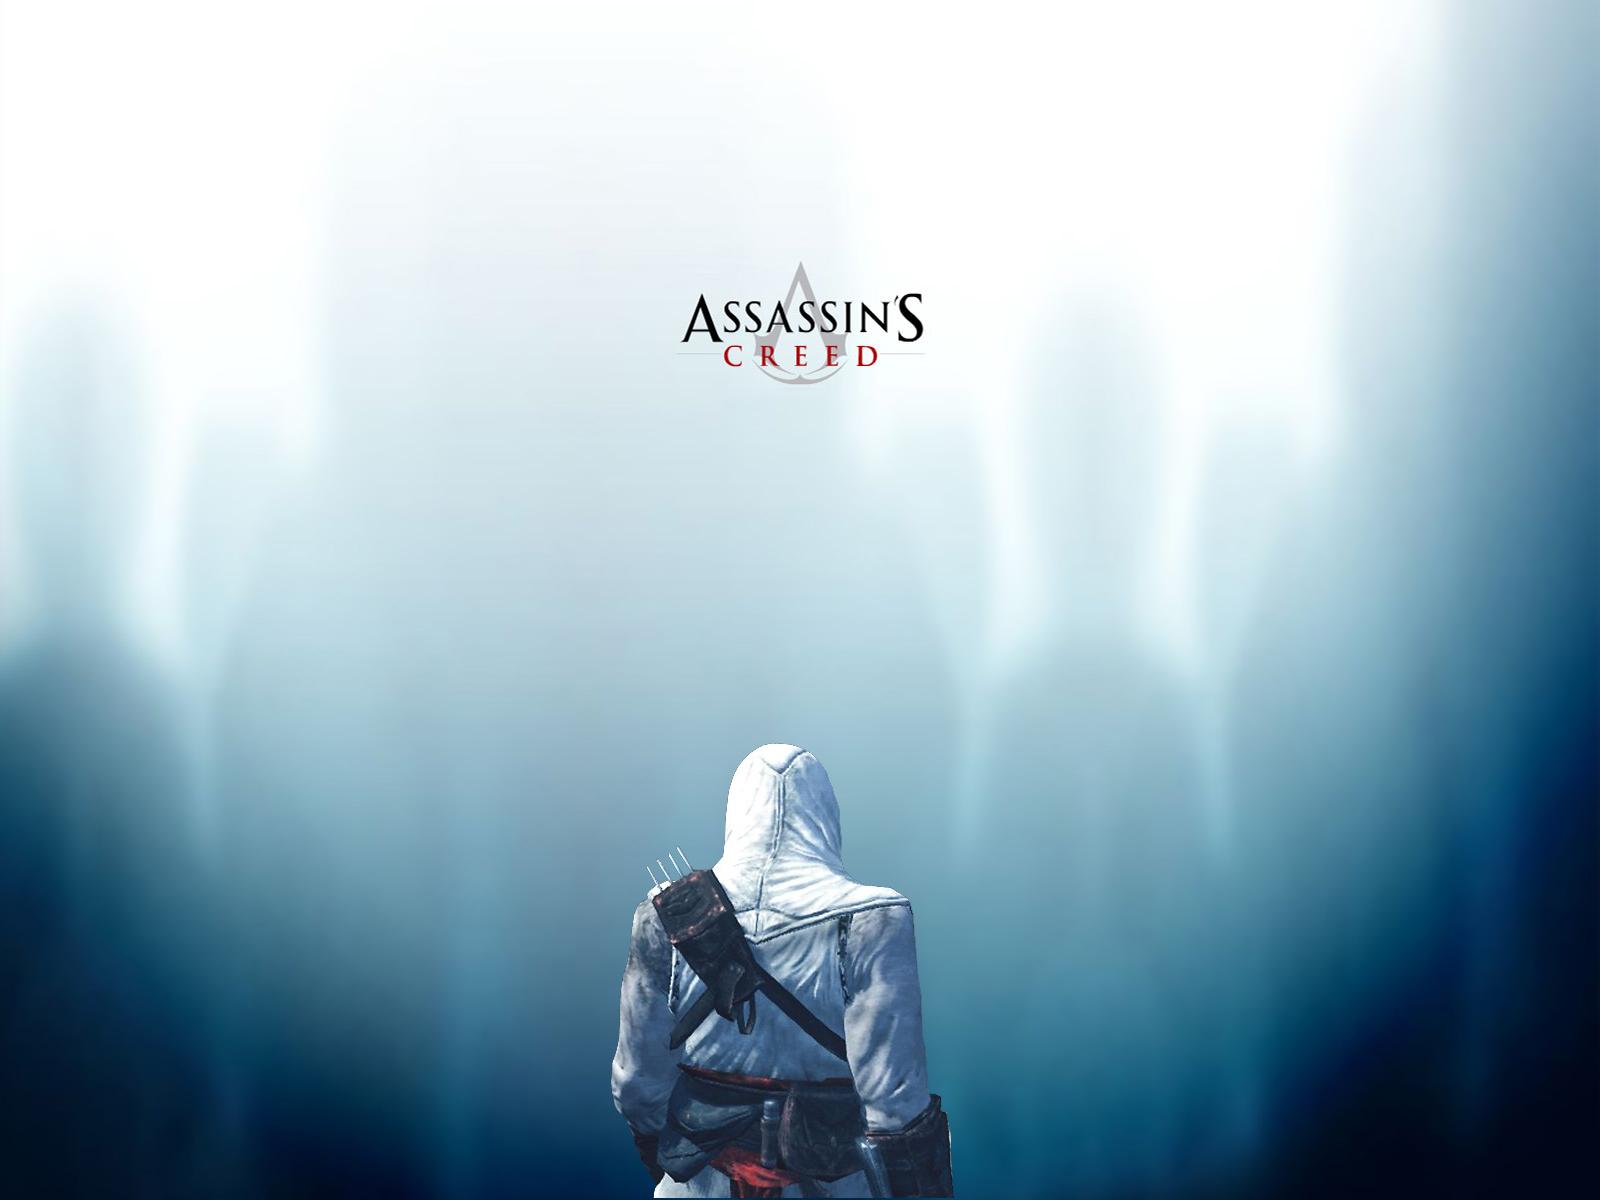 http://4.bp.blogspot.com/-ge3xMLnzITc/TZXdLEKZl8I/AAAAAAAADPg/1OHVSSoKmYk/s1600/Assassins_Creed_HD_Wallpapers_2.jpg